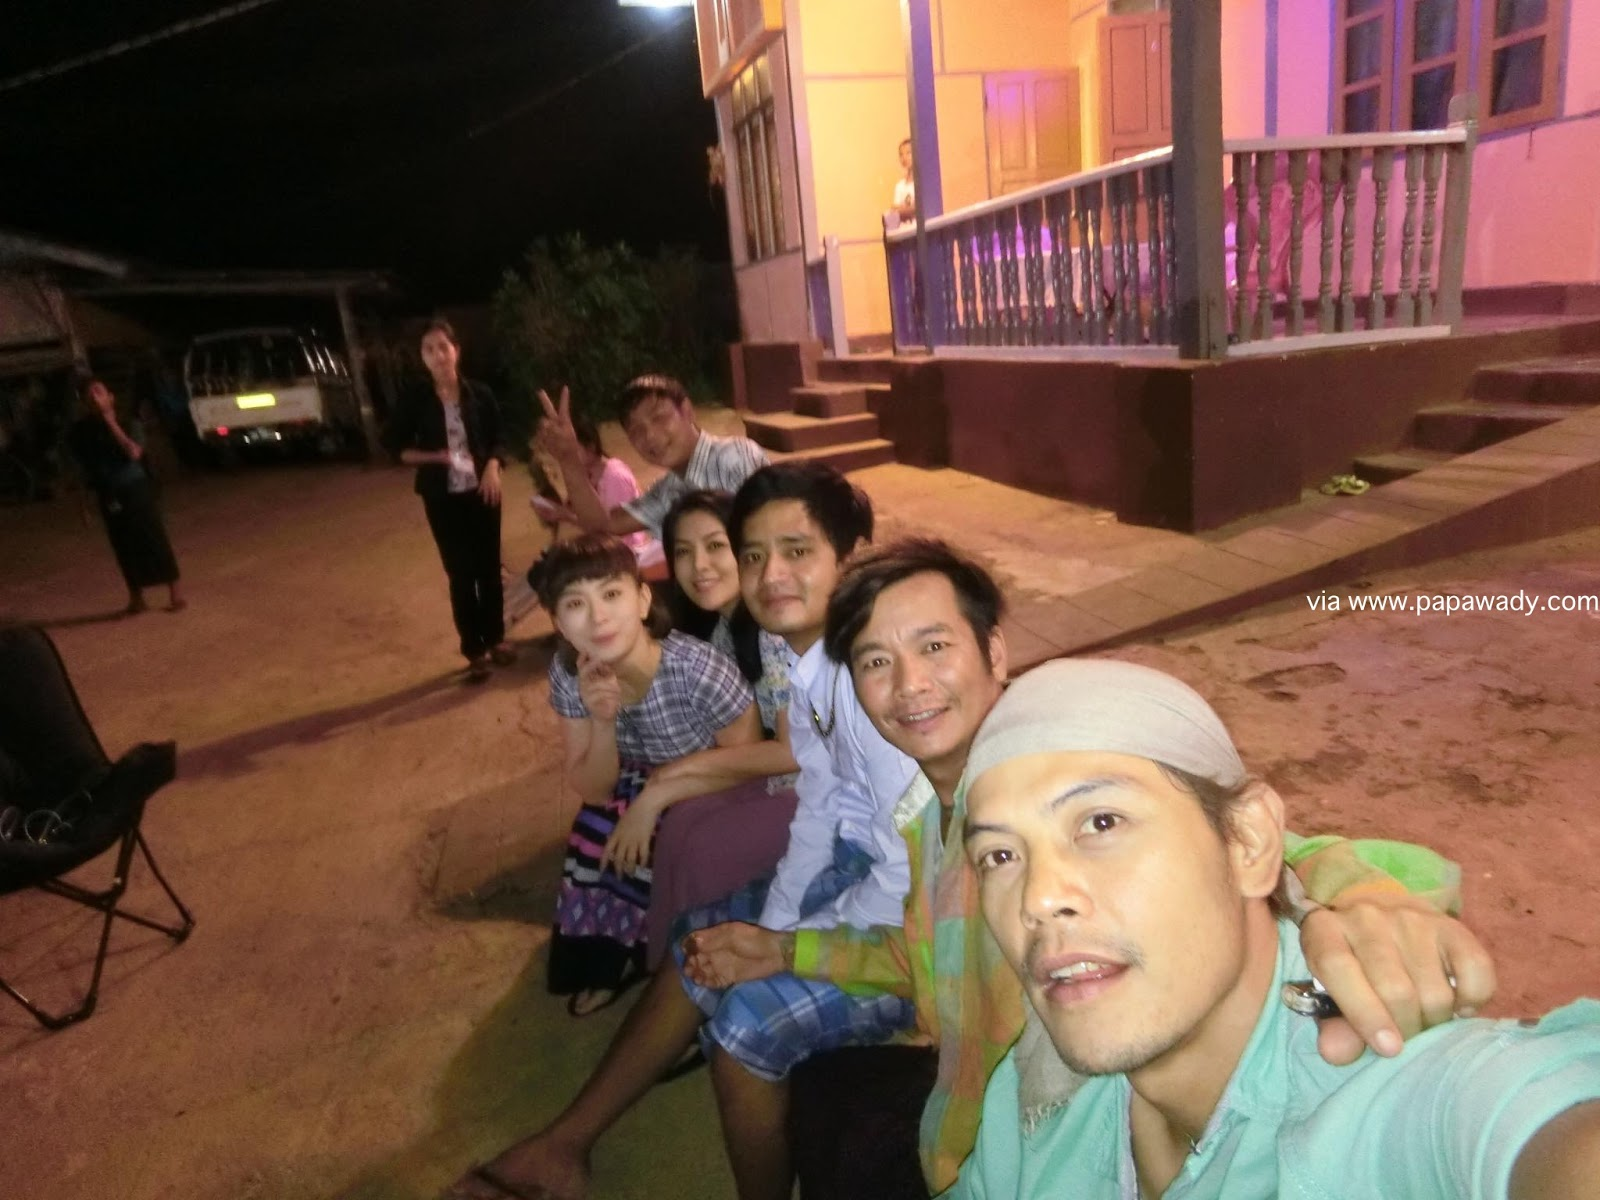 Wut Mhone Shwe Yi Behind The Scenes Photos In Pyin Oo Lwin